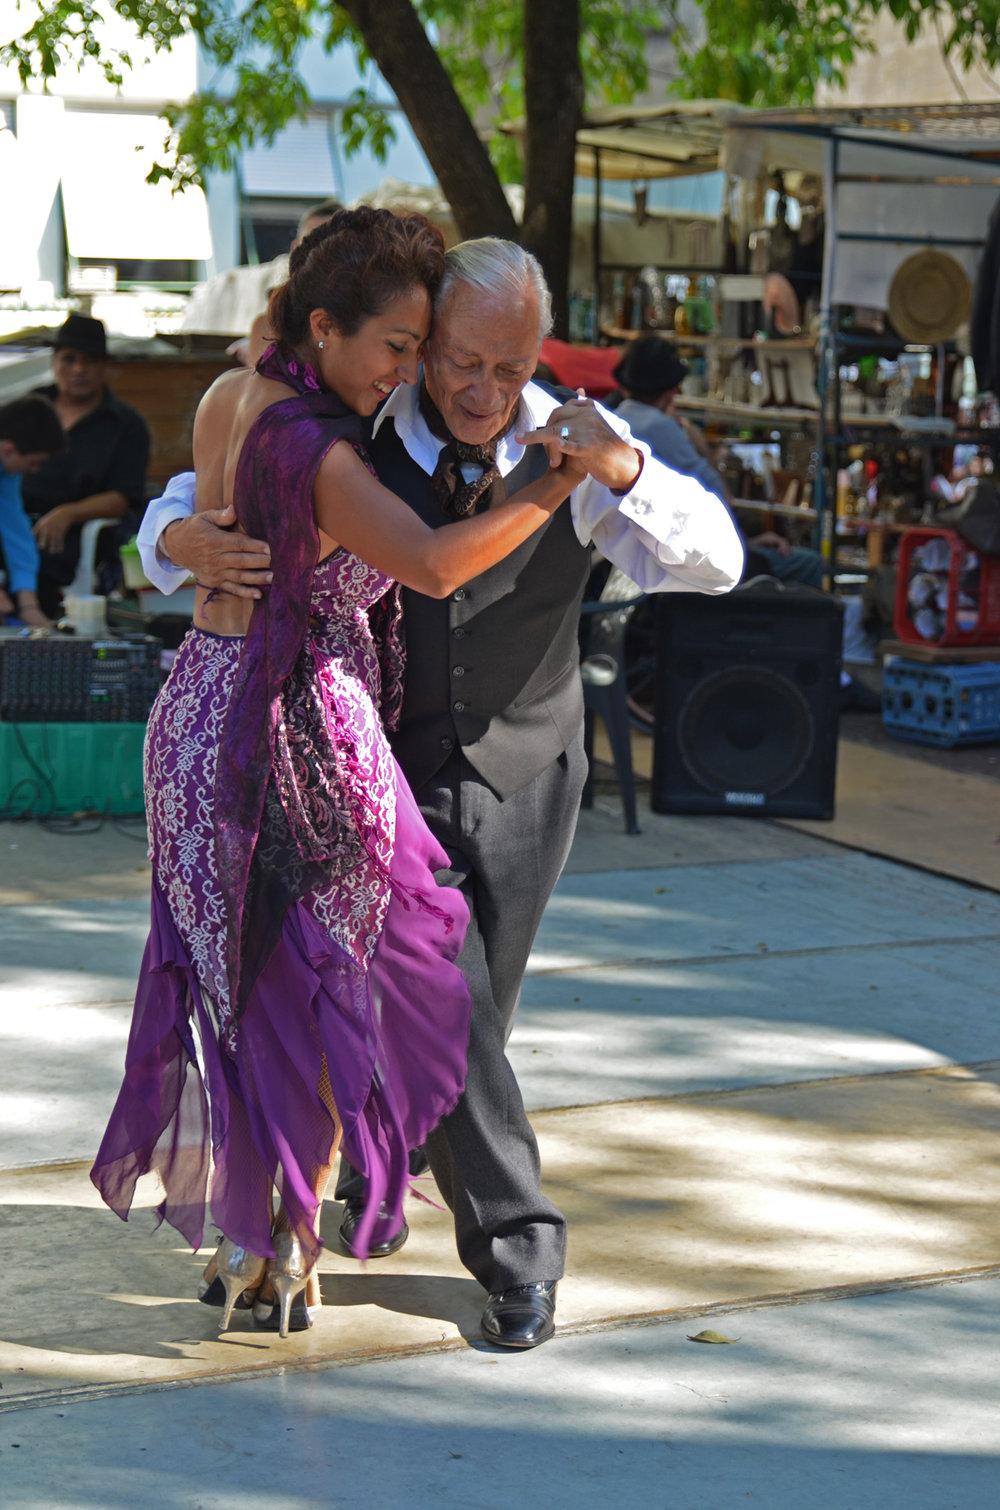 A couple dancing tango at the San Telmo weekend market.